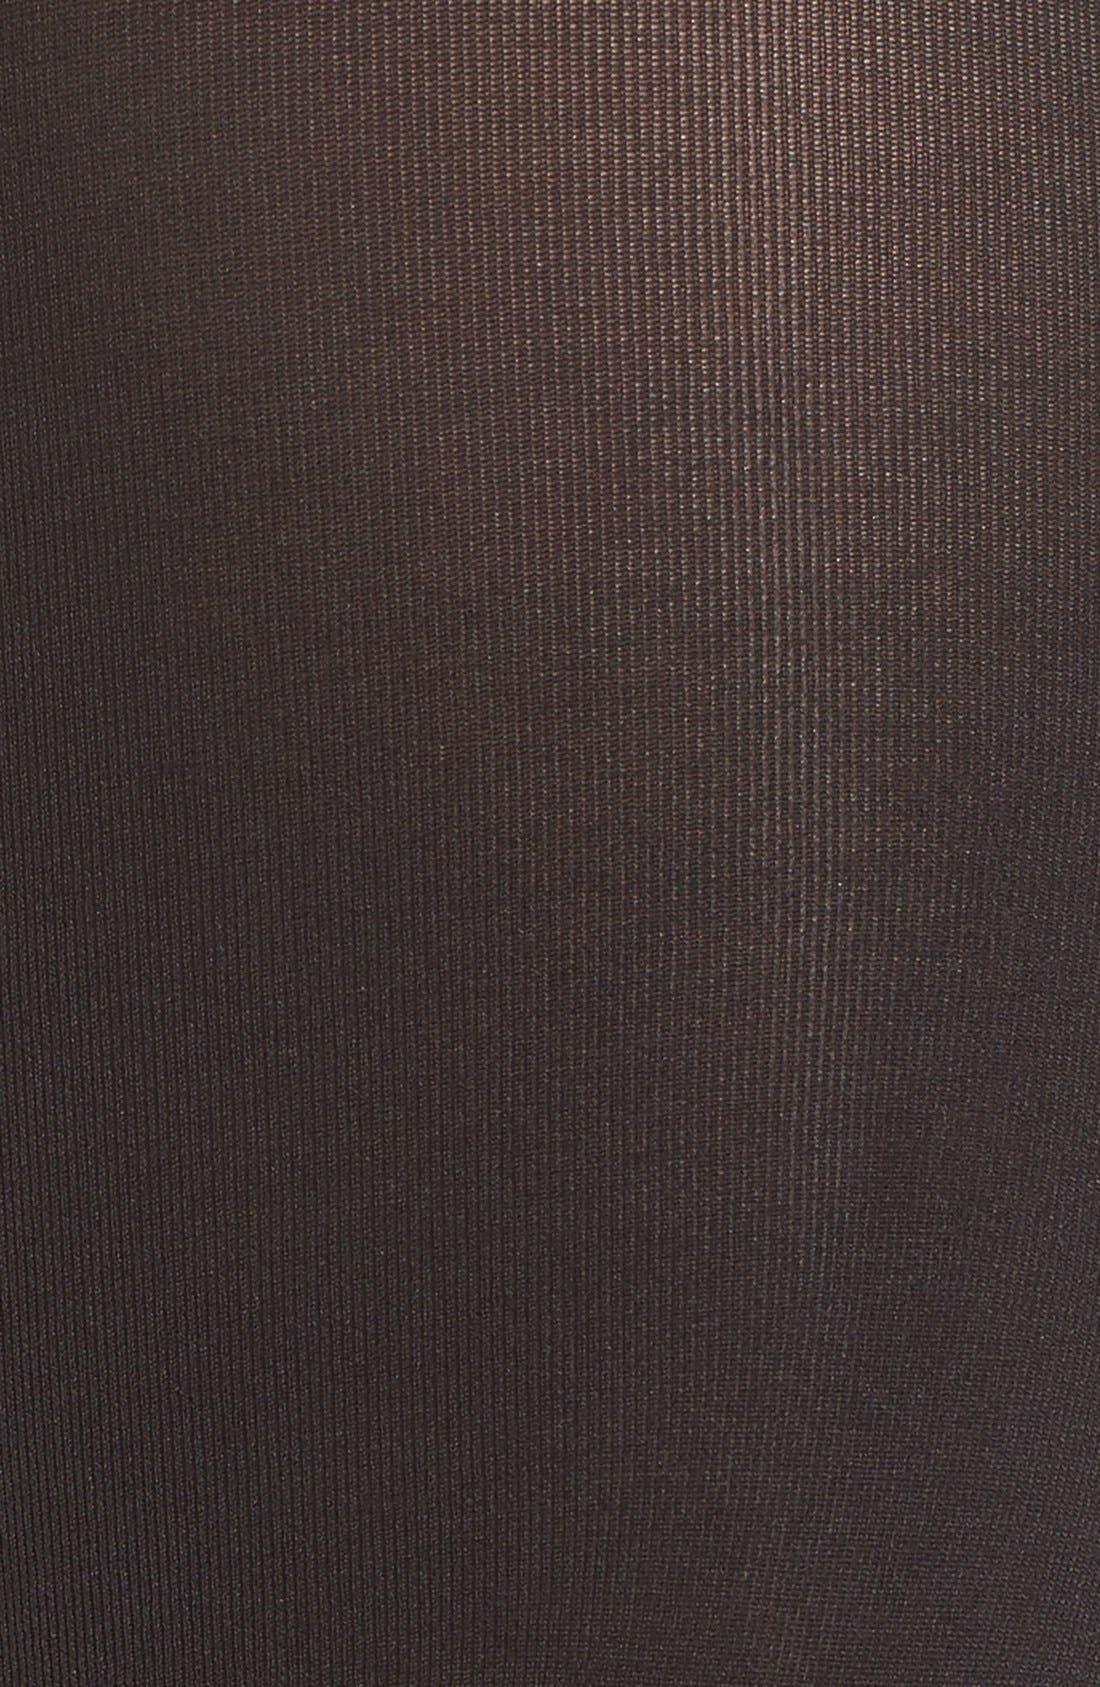 DKNY, 'Super Opaque' Control Top Tights, Alternate thumbnail 2, color, 002